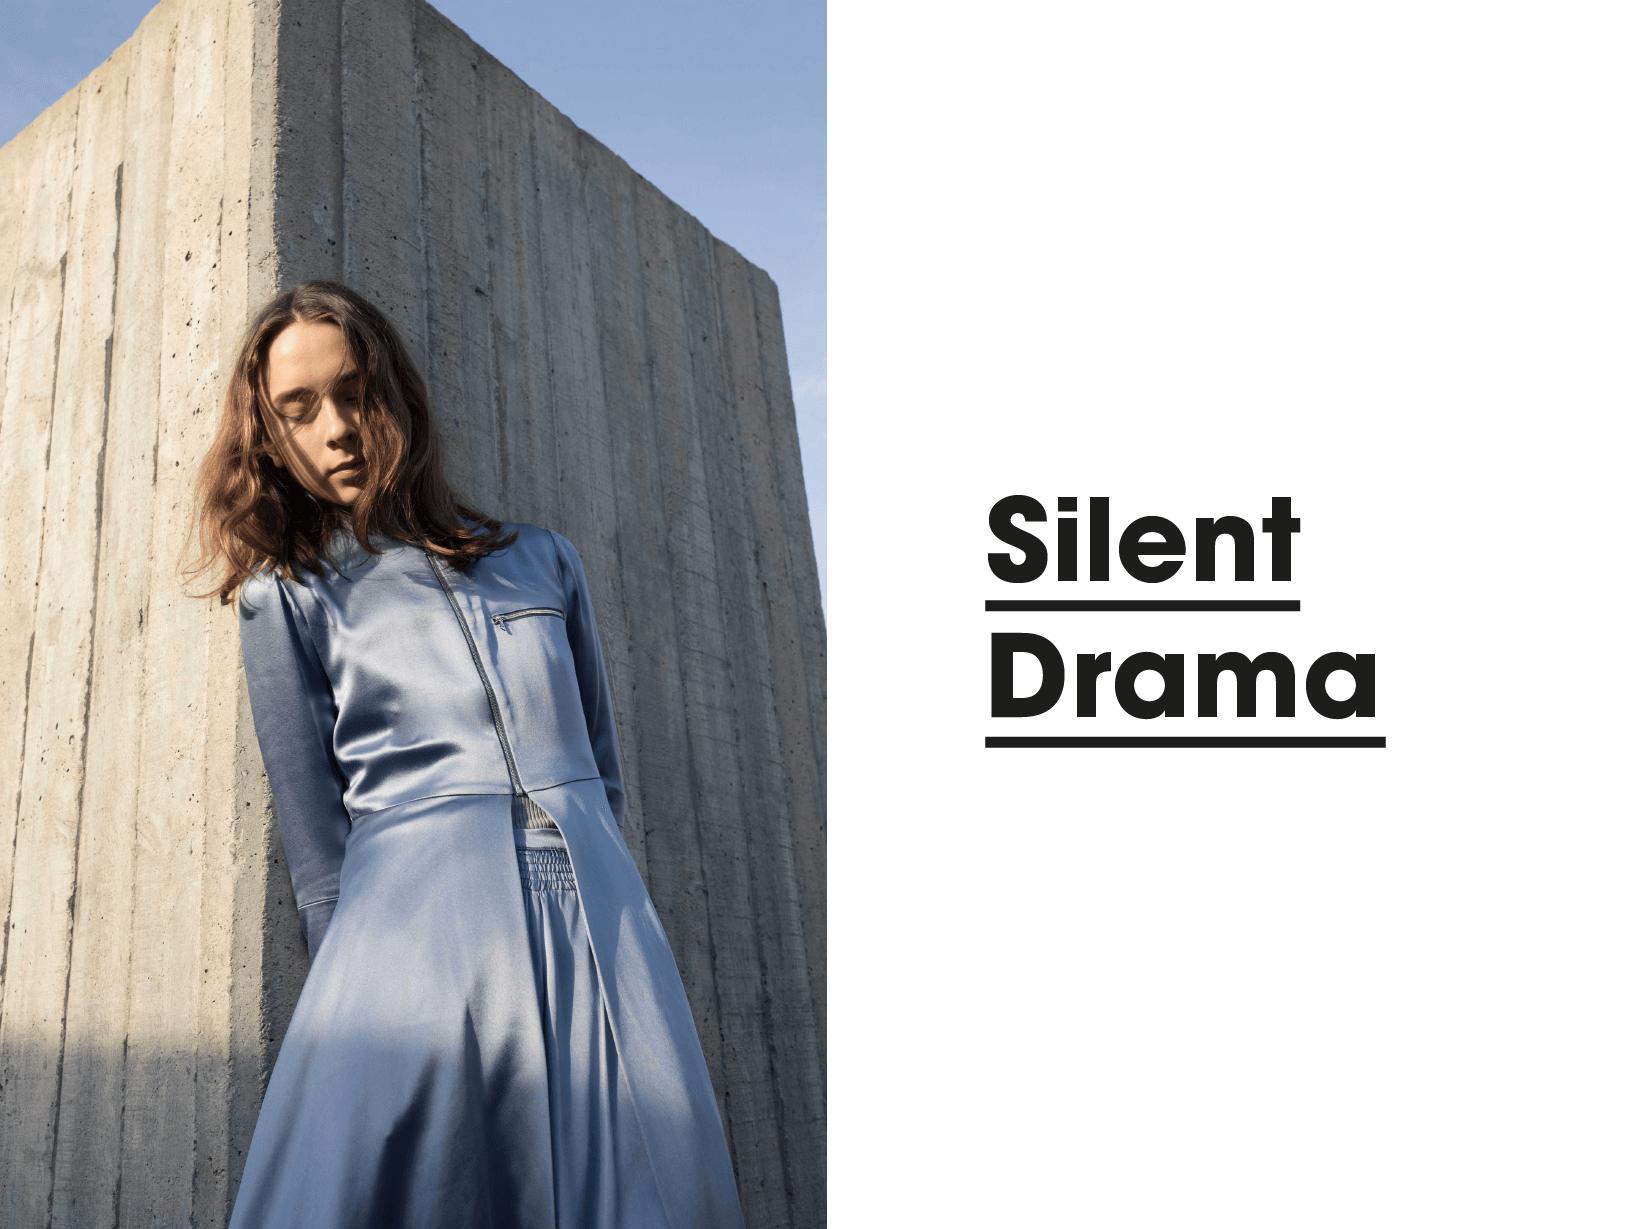 Silent Drama